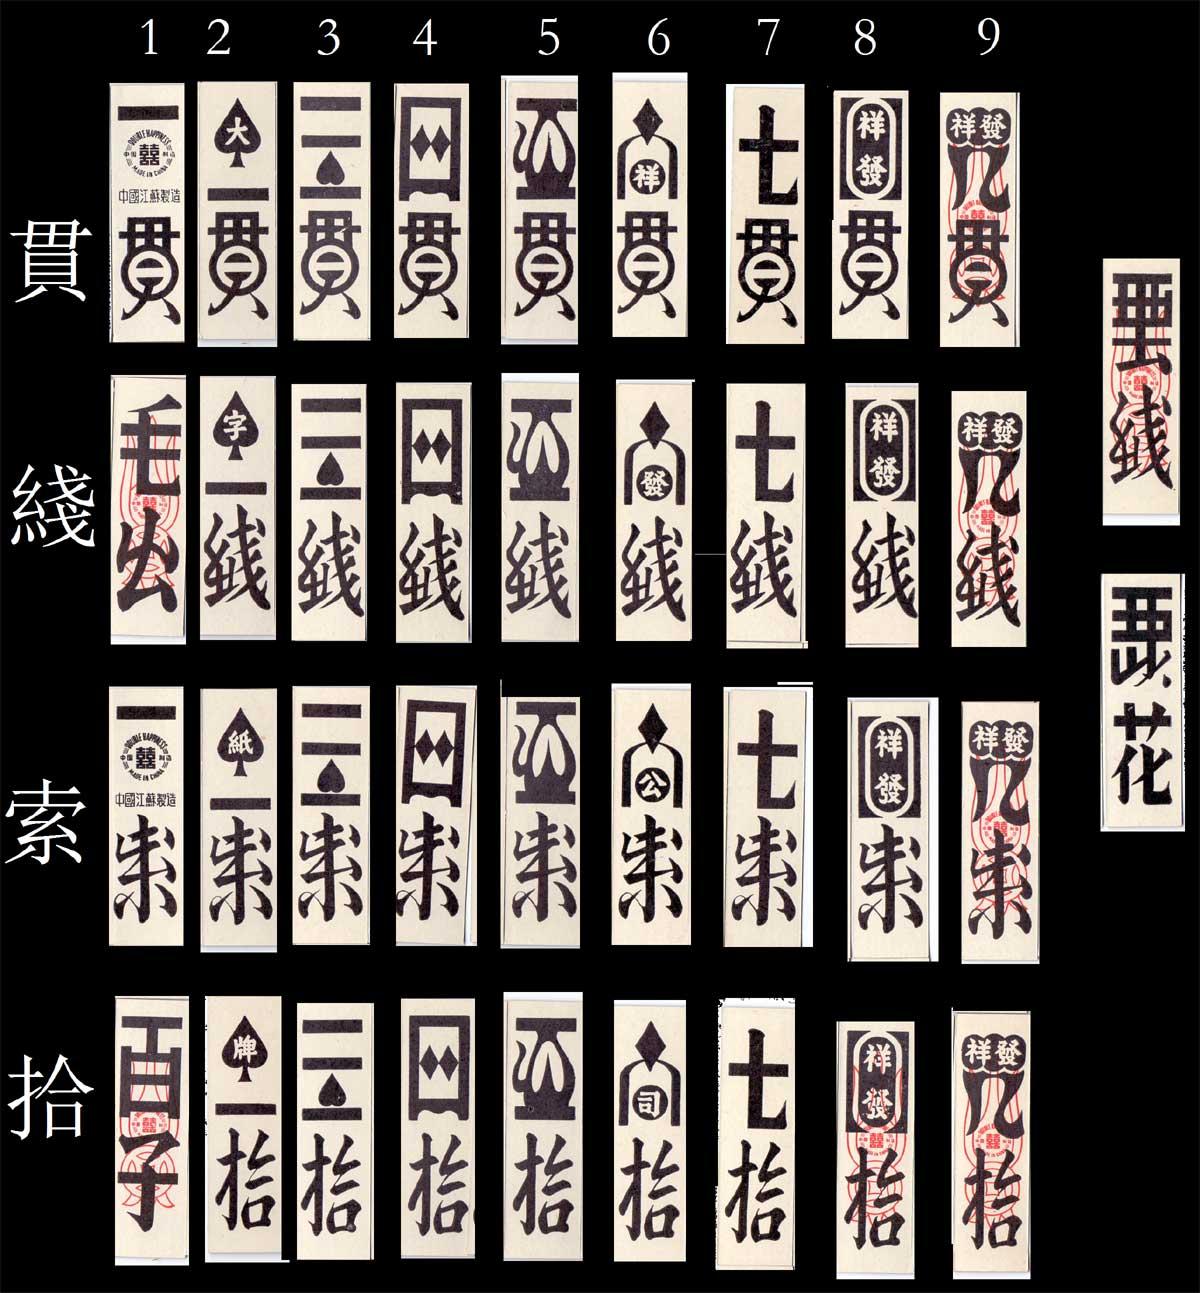 """Double Happiness"" brand Hakka [客家] playing cards used by Hakka ethnic communities"